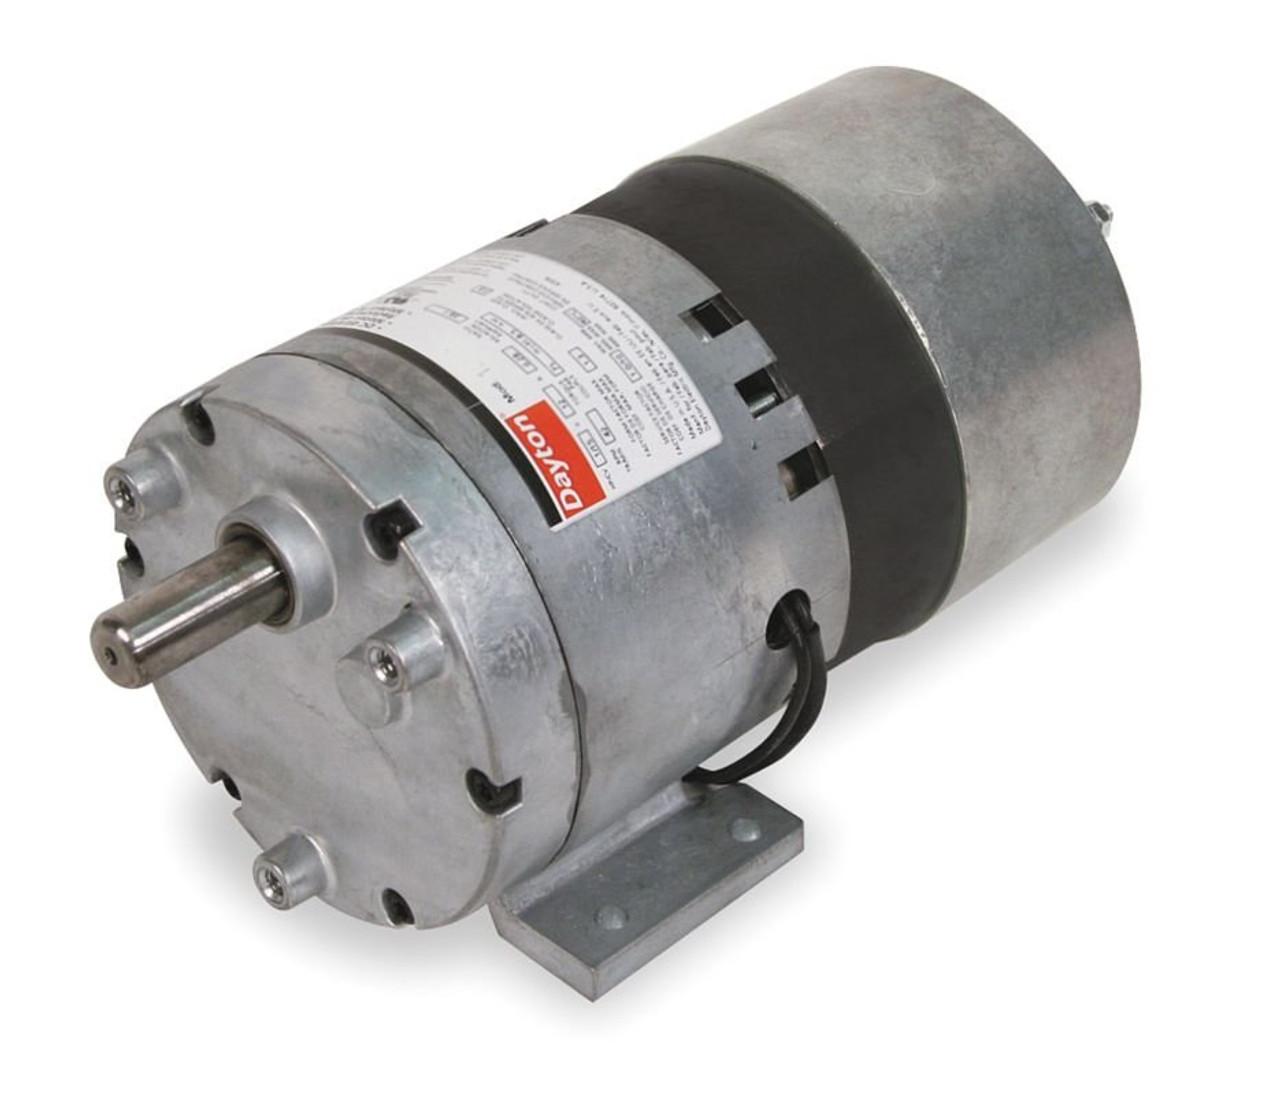 hight resolution of  dayton model 1lpl6 gear motor 60 rpm 1 10 hp 115v 3m138 on 76 ly dayton gear motor wiring diagram